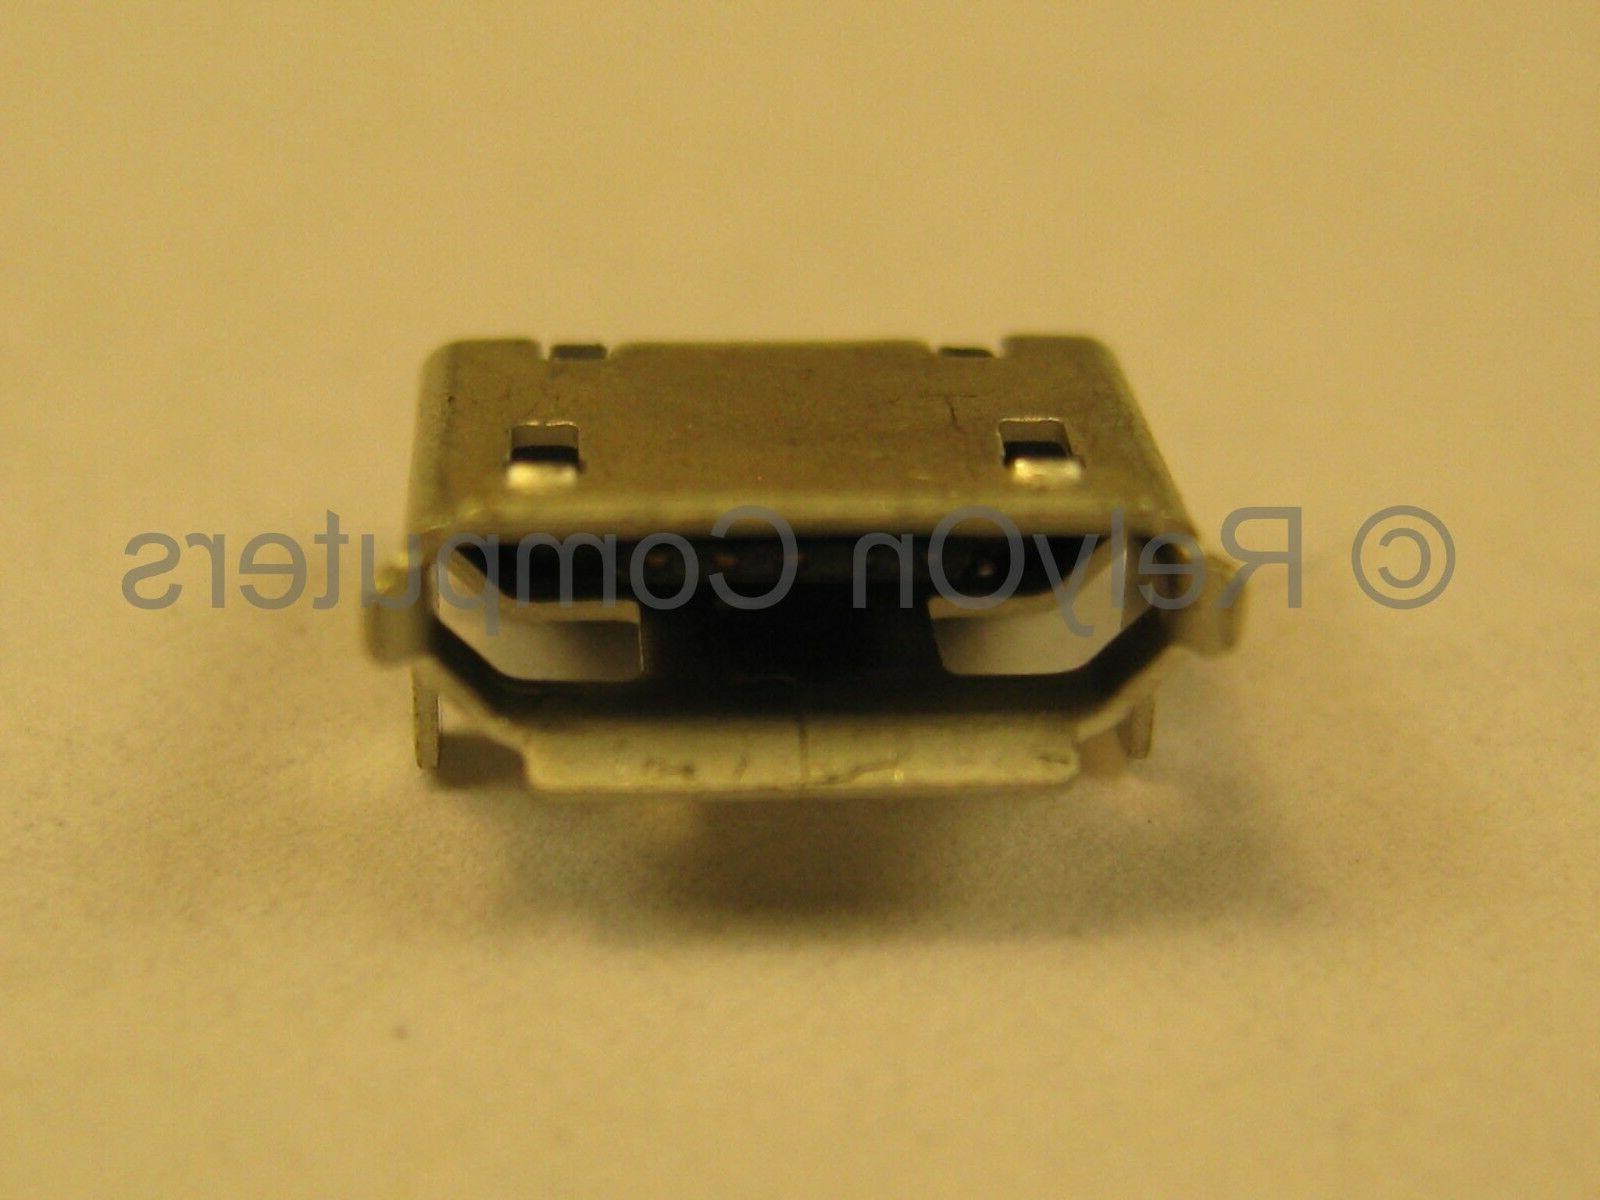 10x Micro Beats 1.0 Bluetooth USA